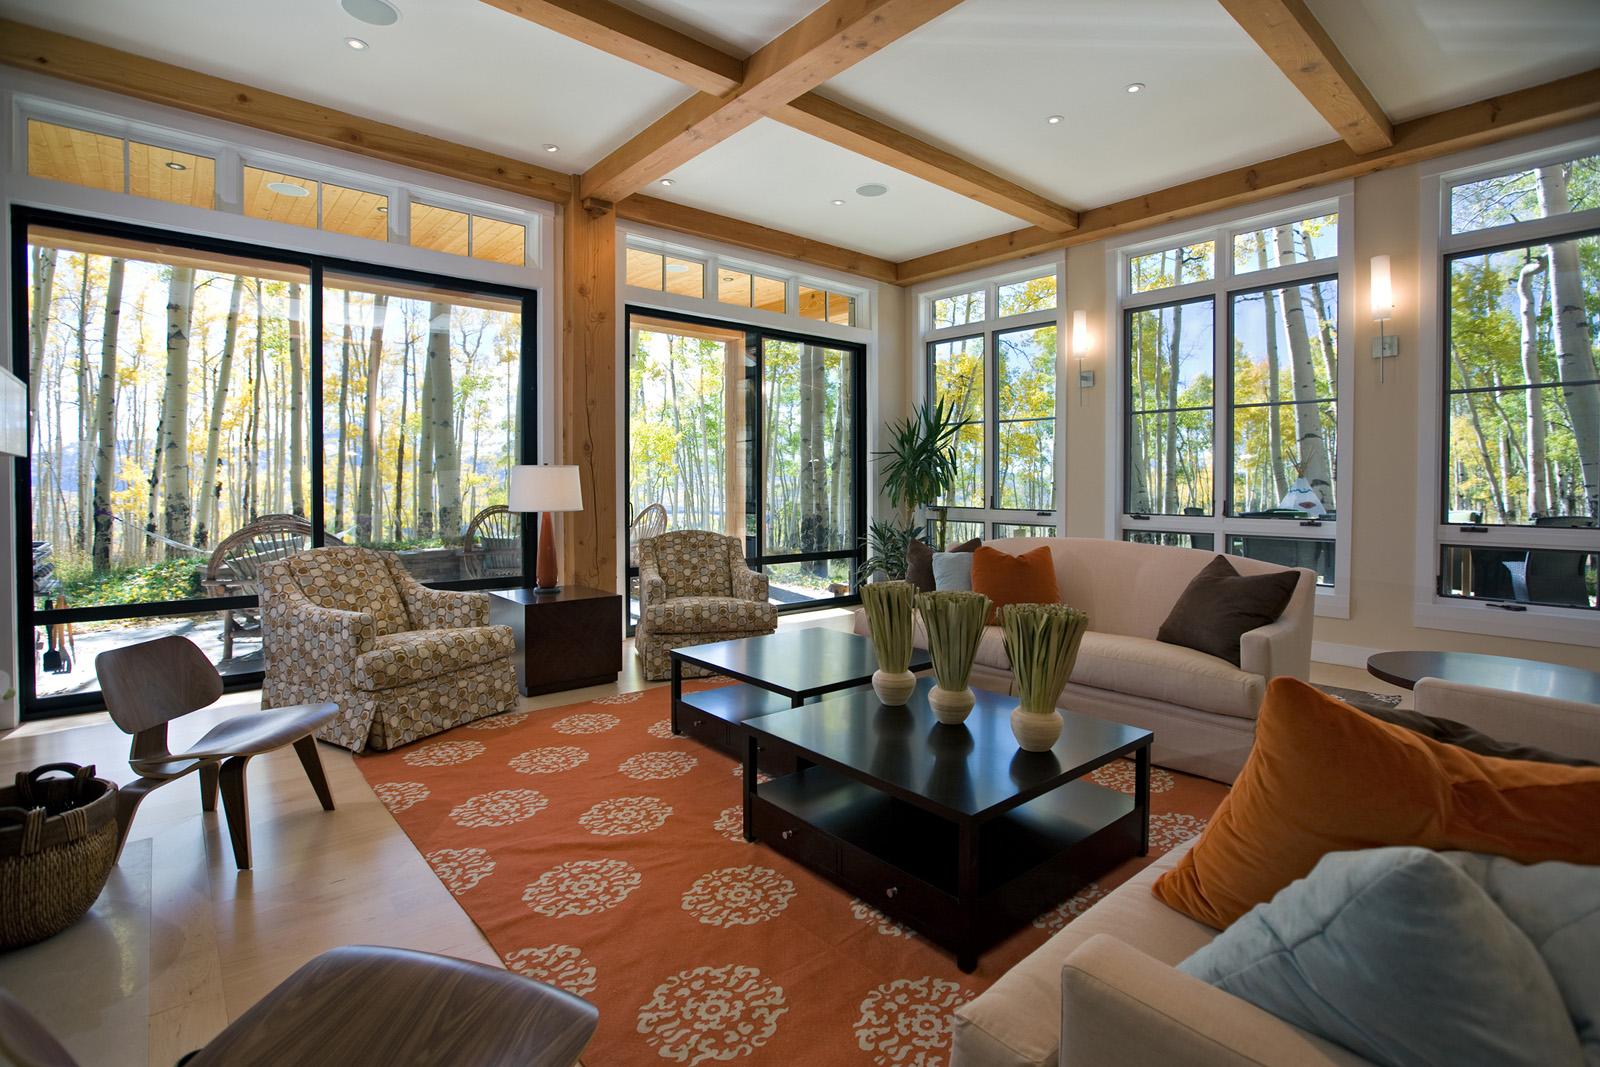 photo taken for Tweed Interior Design